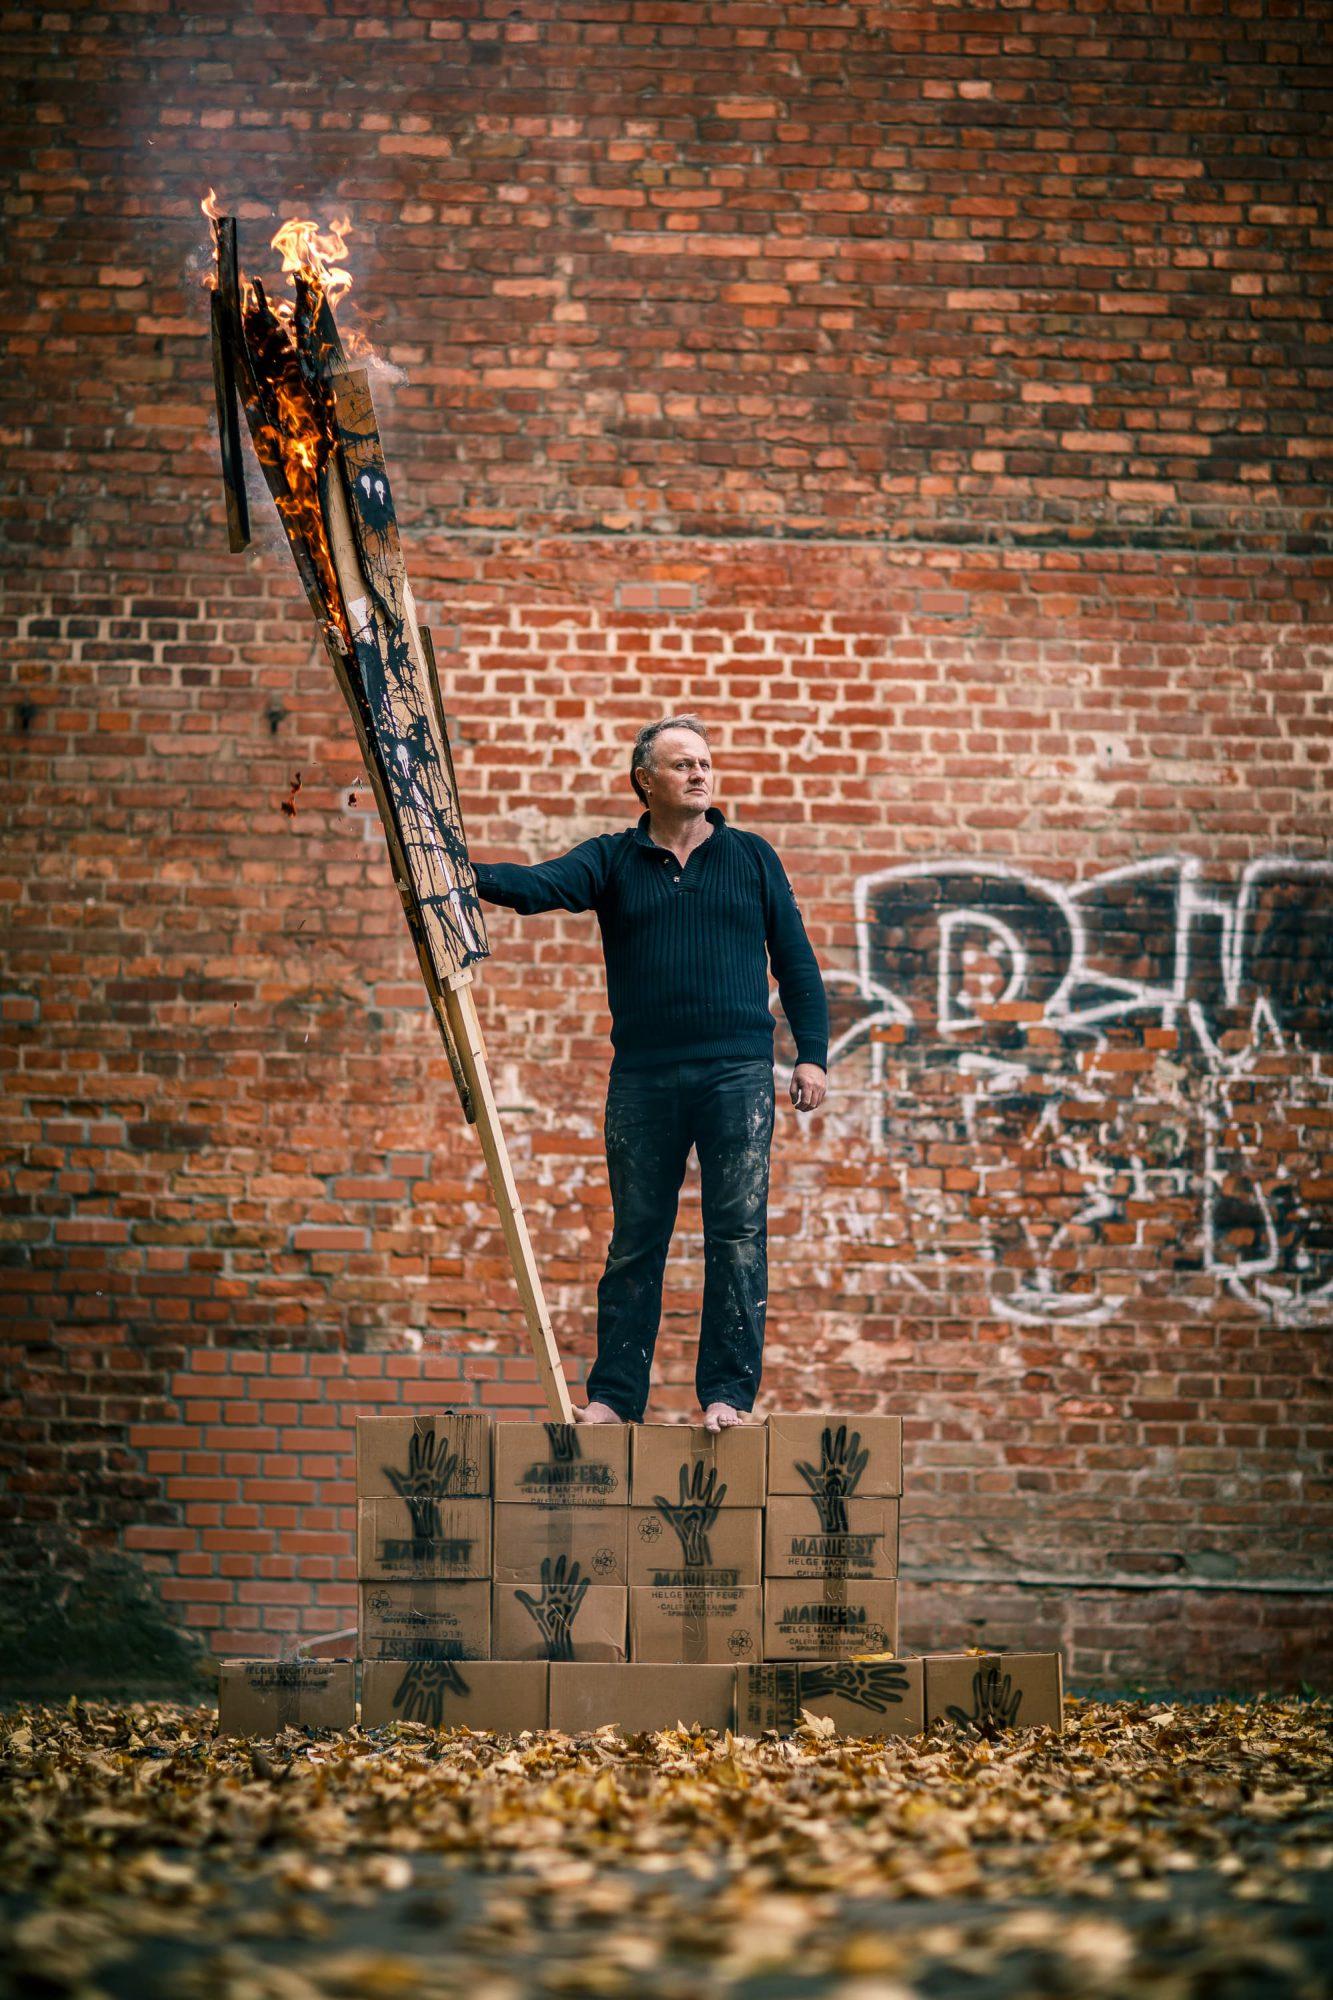 Regentaucher Portraitfotografie | Helge Hommes